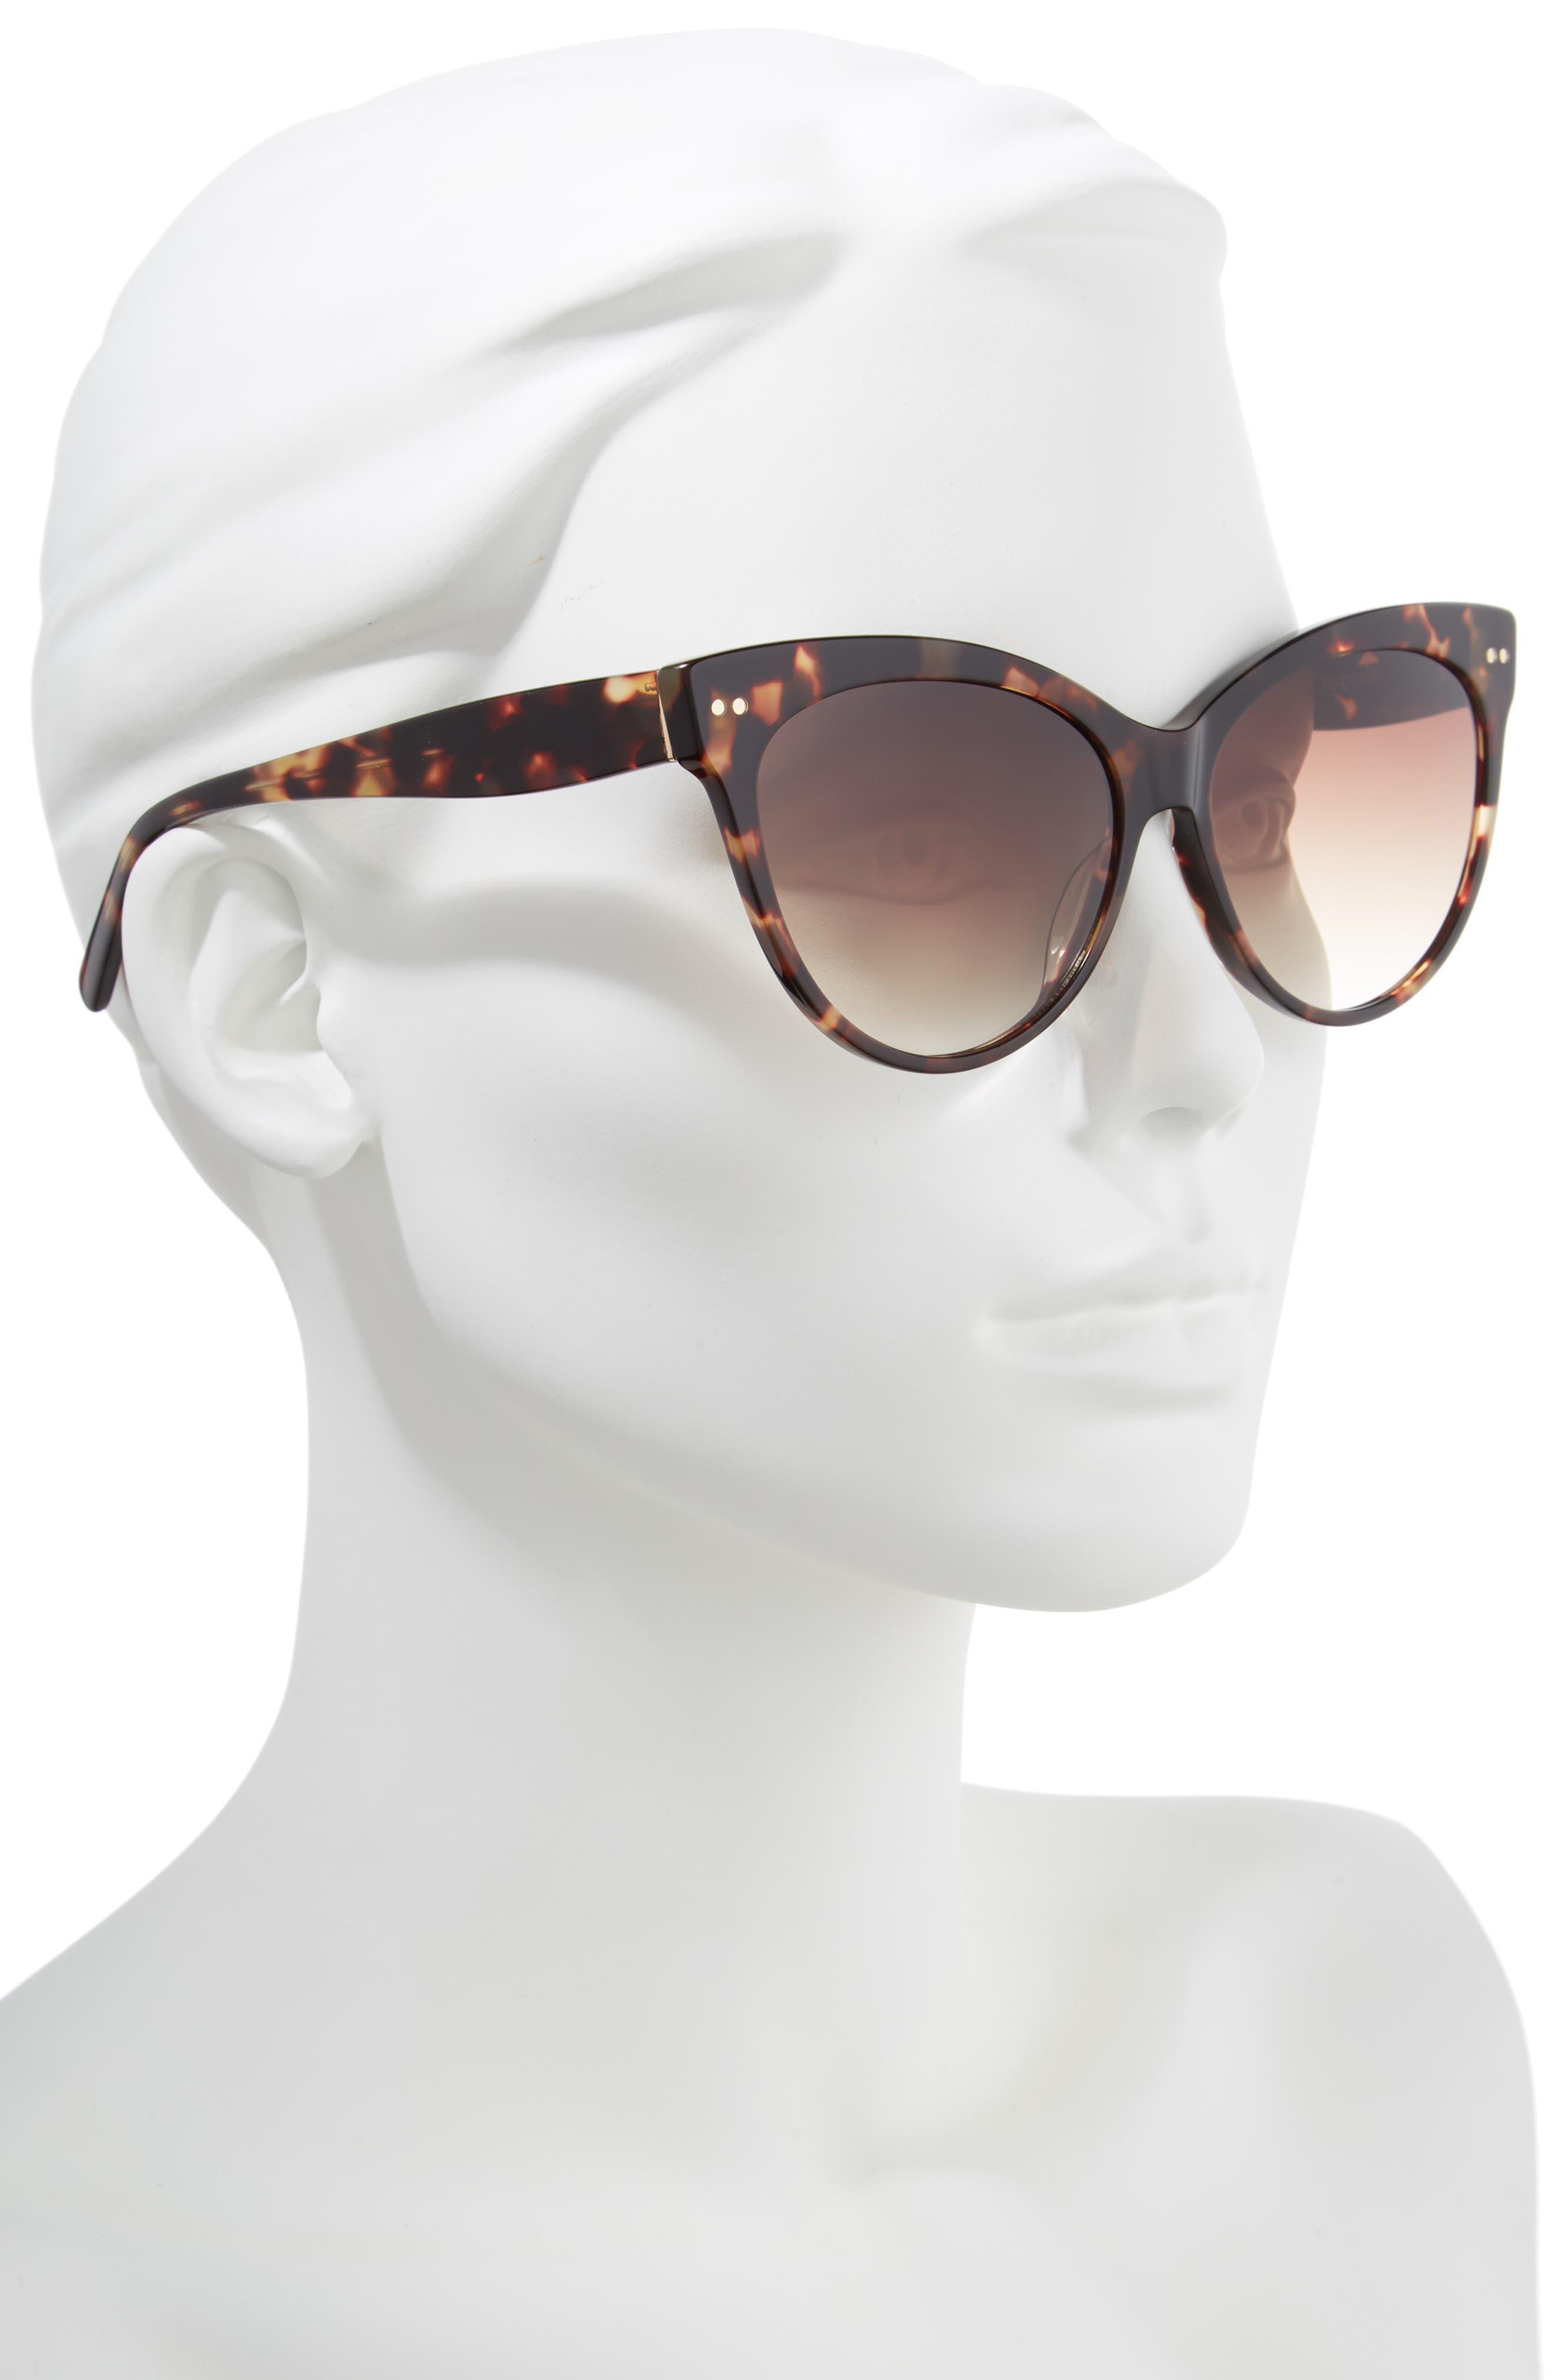 Audrey 60mm Cat Eye Sunglasses,                             Alternate thumbnail 2, color,                             Brown Tortoise